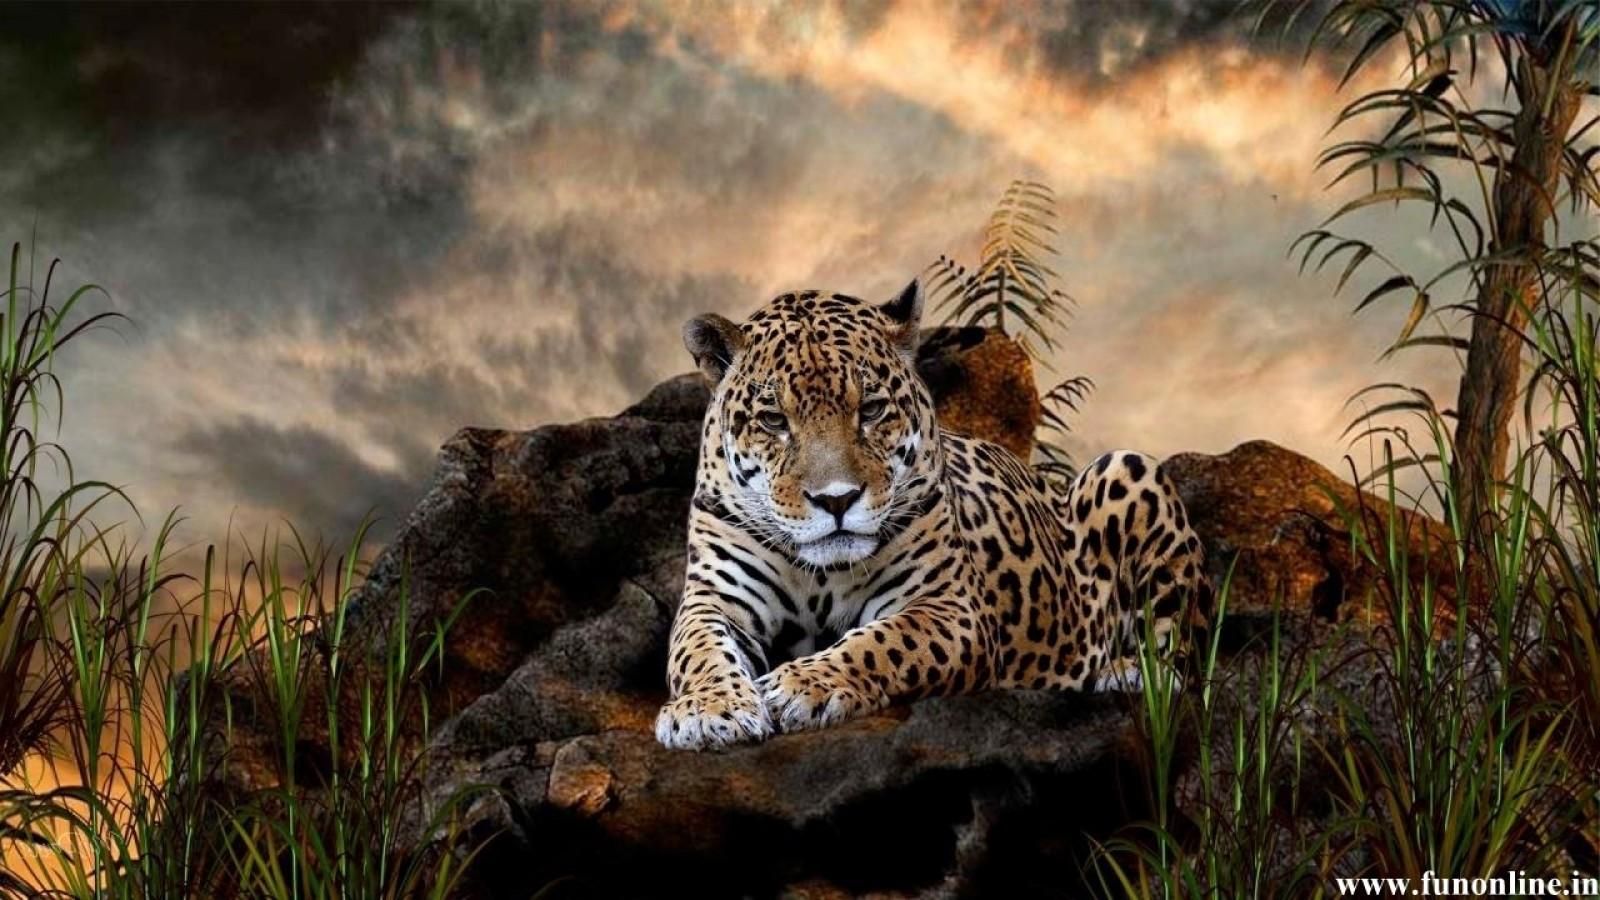 Hd wallpaper jaguar - Hd Wallpaper Jaguar Jaguar Wallpapers Stunning Jaguar Hd Wallpapers For Free Download